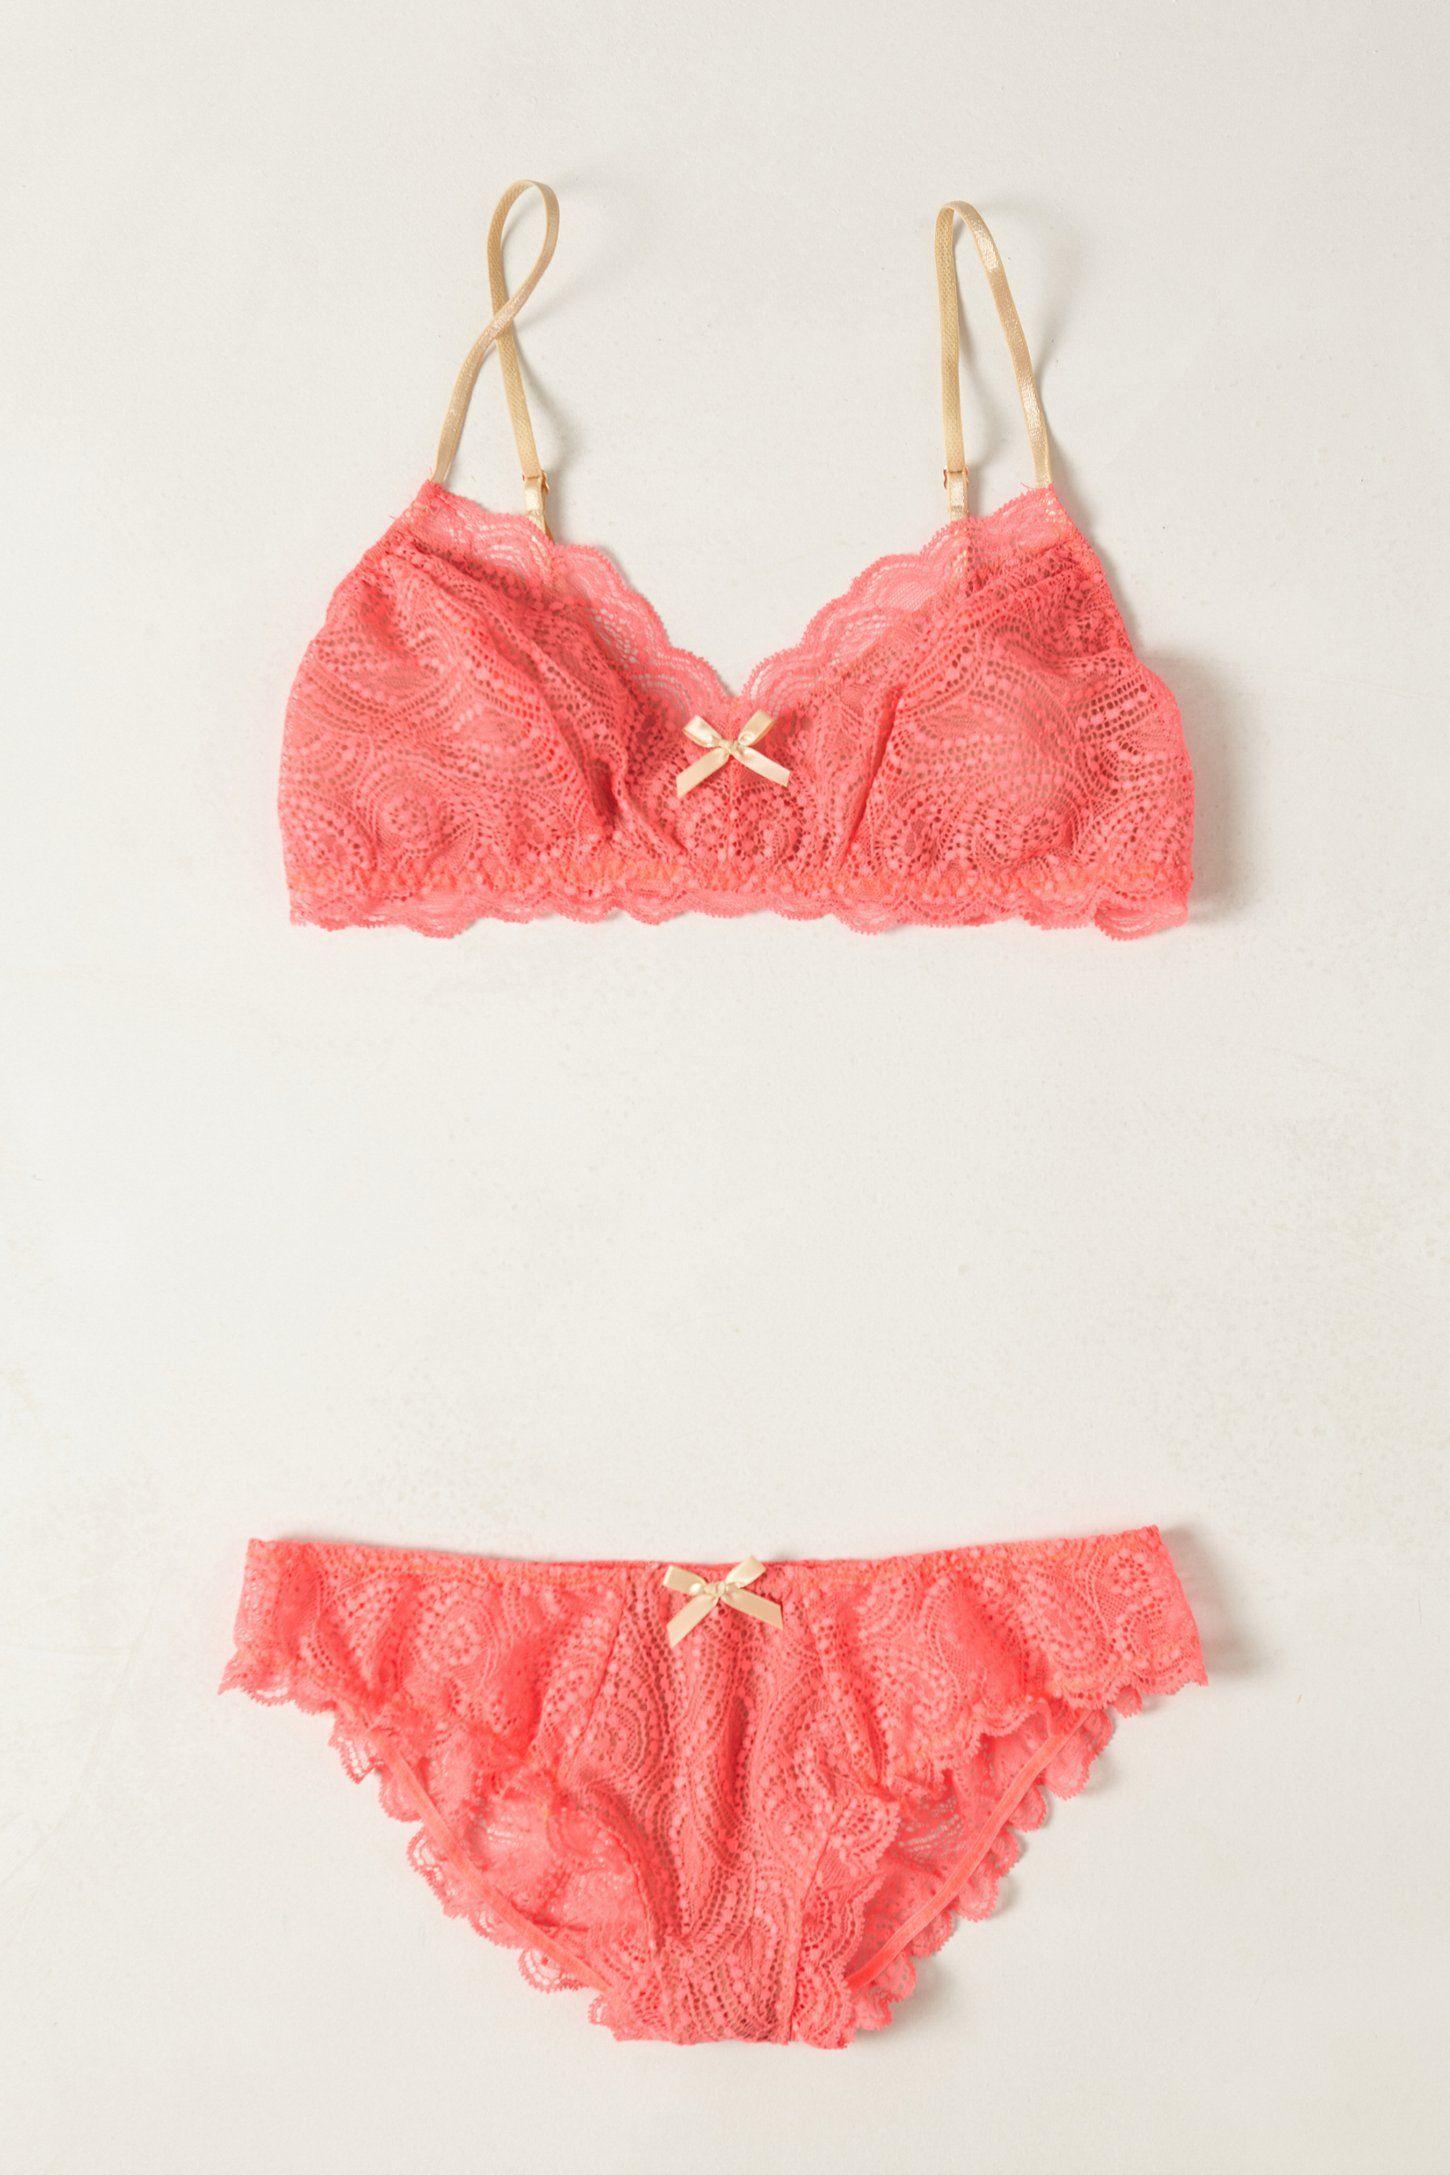 Auroral Lacy Bralette - Anthropologie.com - Sale: Panties & Bra Set $48.00 (06.21.13)